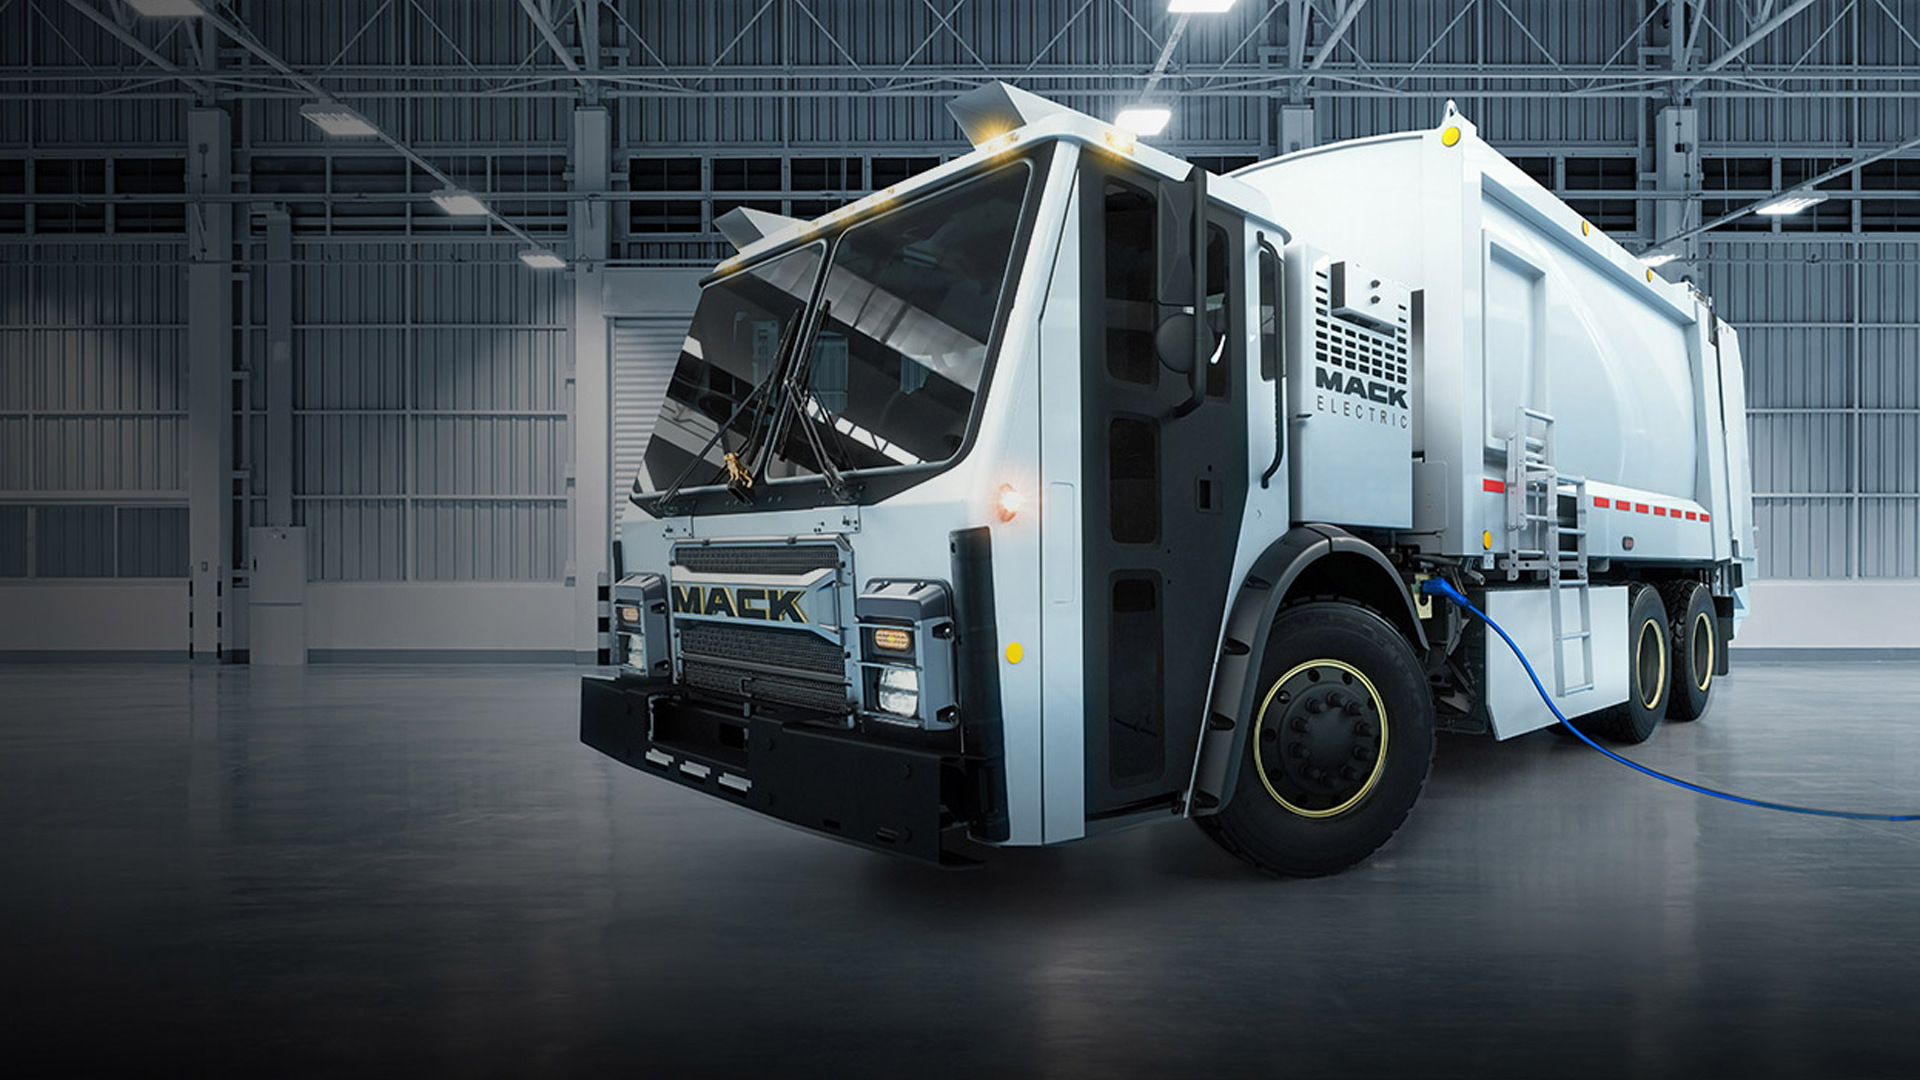 Mack Electric LR garbage truck